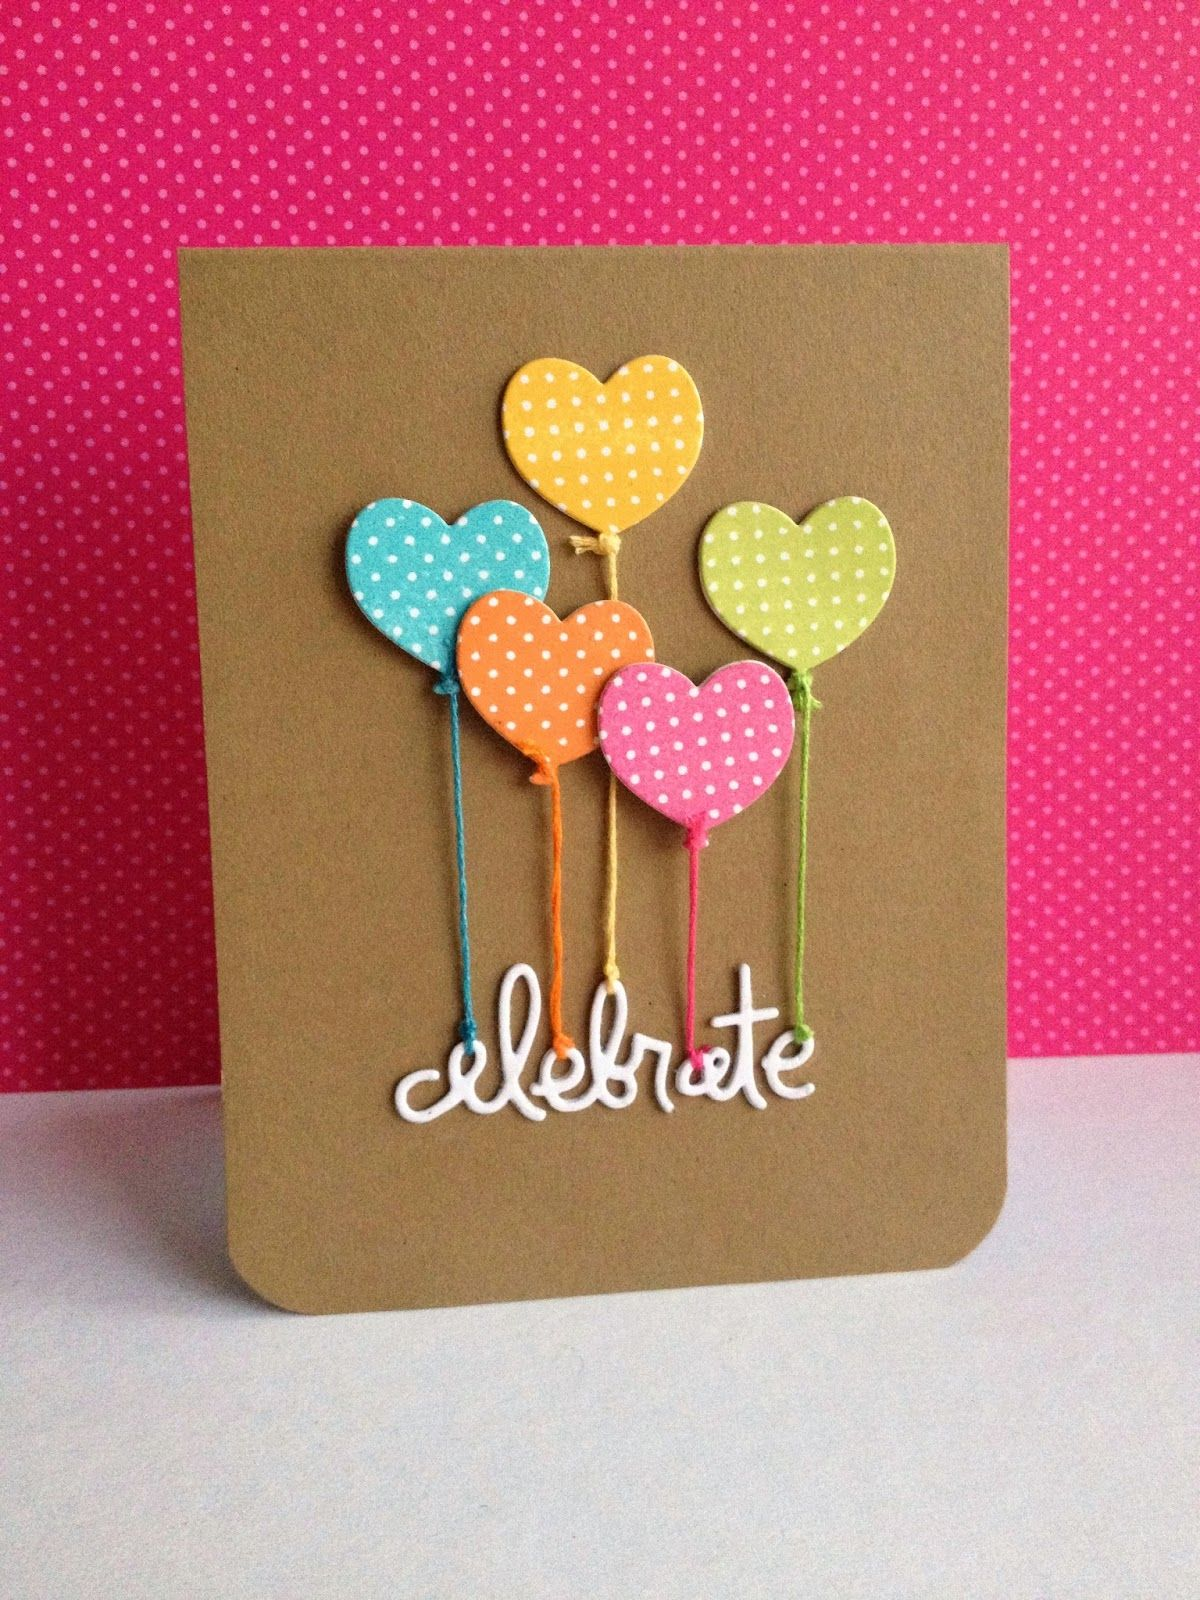 Handmade scrapbook ideas for birthday - Balloon Ideas